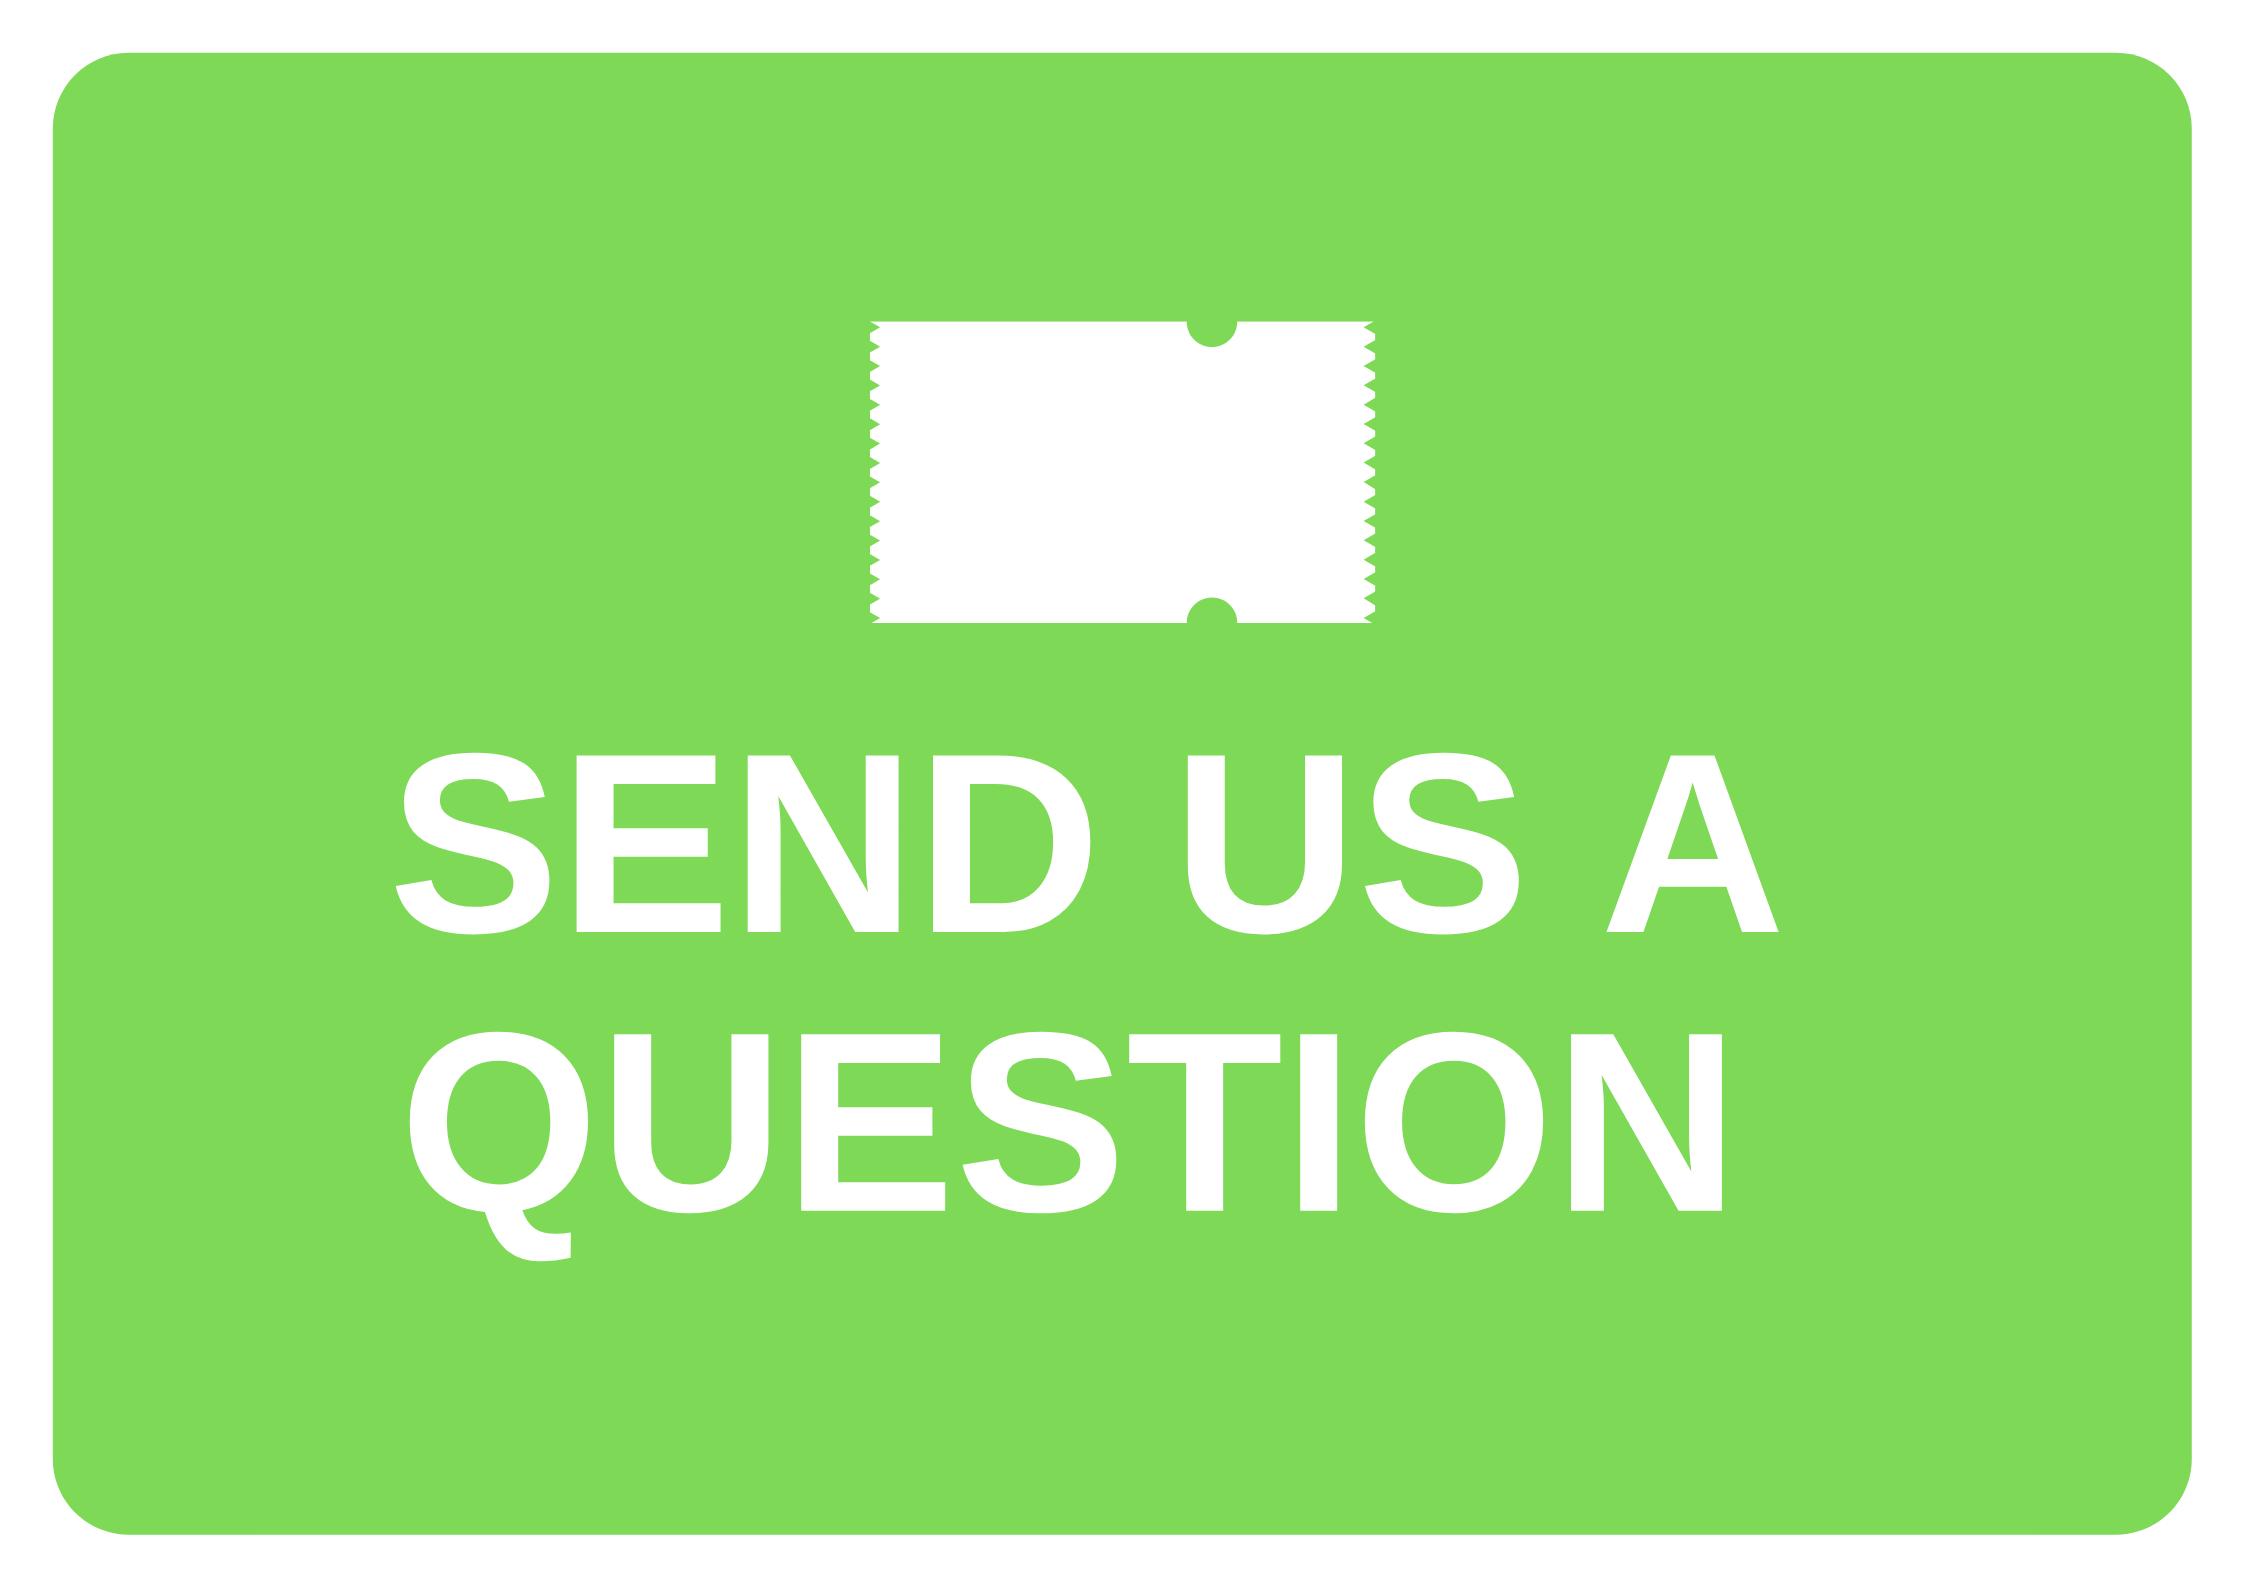 Send us a question link